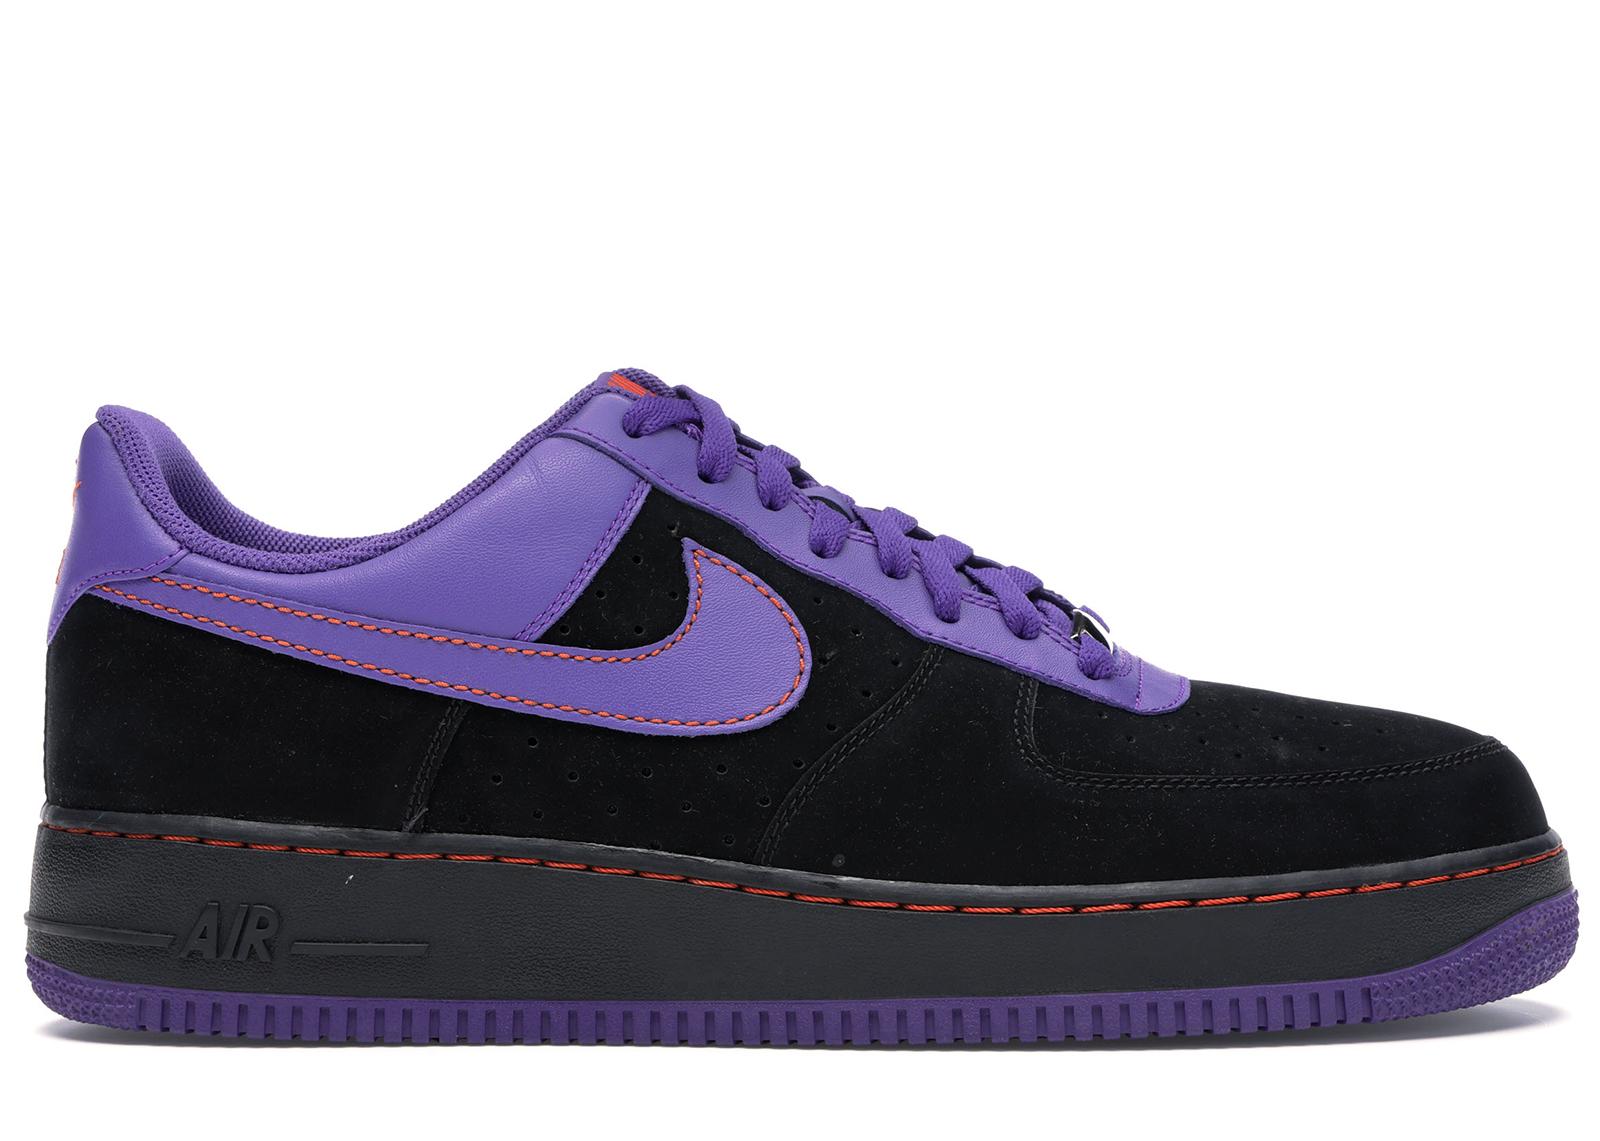 Nike Air Force 1 Low Charles Barkley